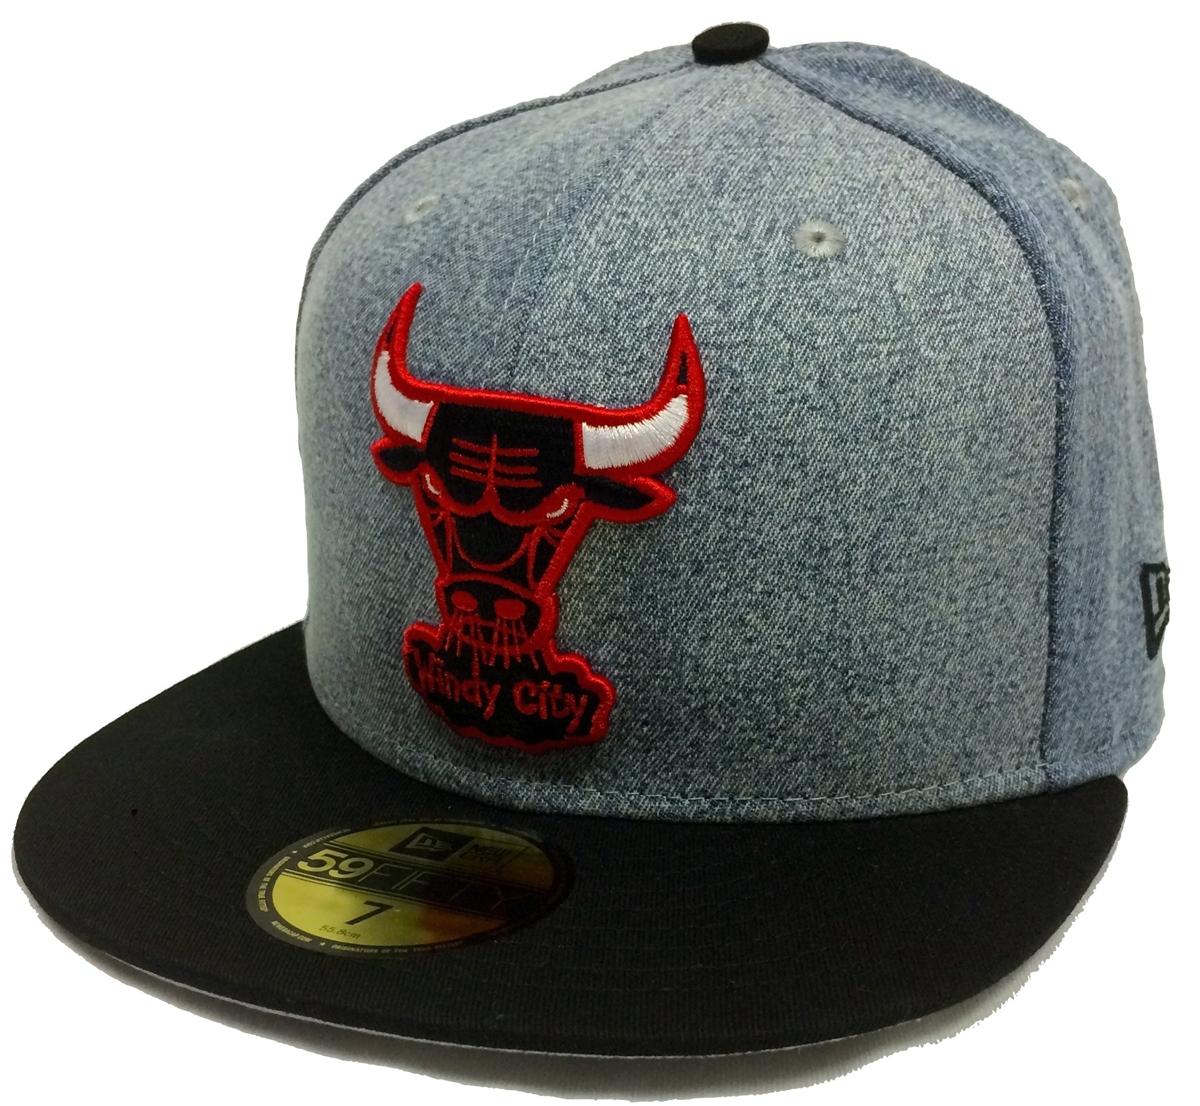 6634eccbb46 New Era 59Fifty Denim Grunger Chicago Bulls Blue   Black Fitted Cap